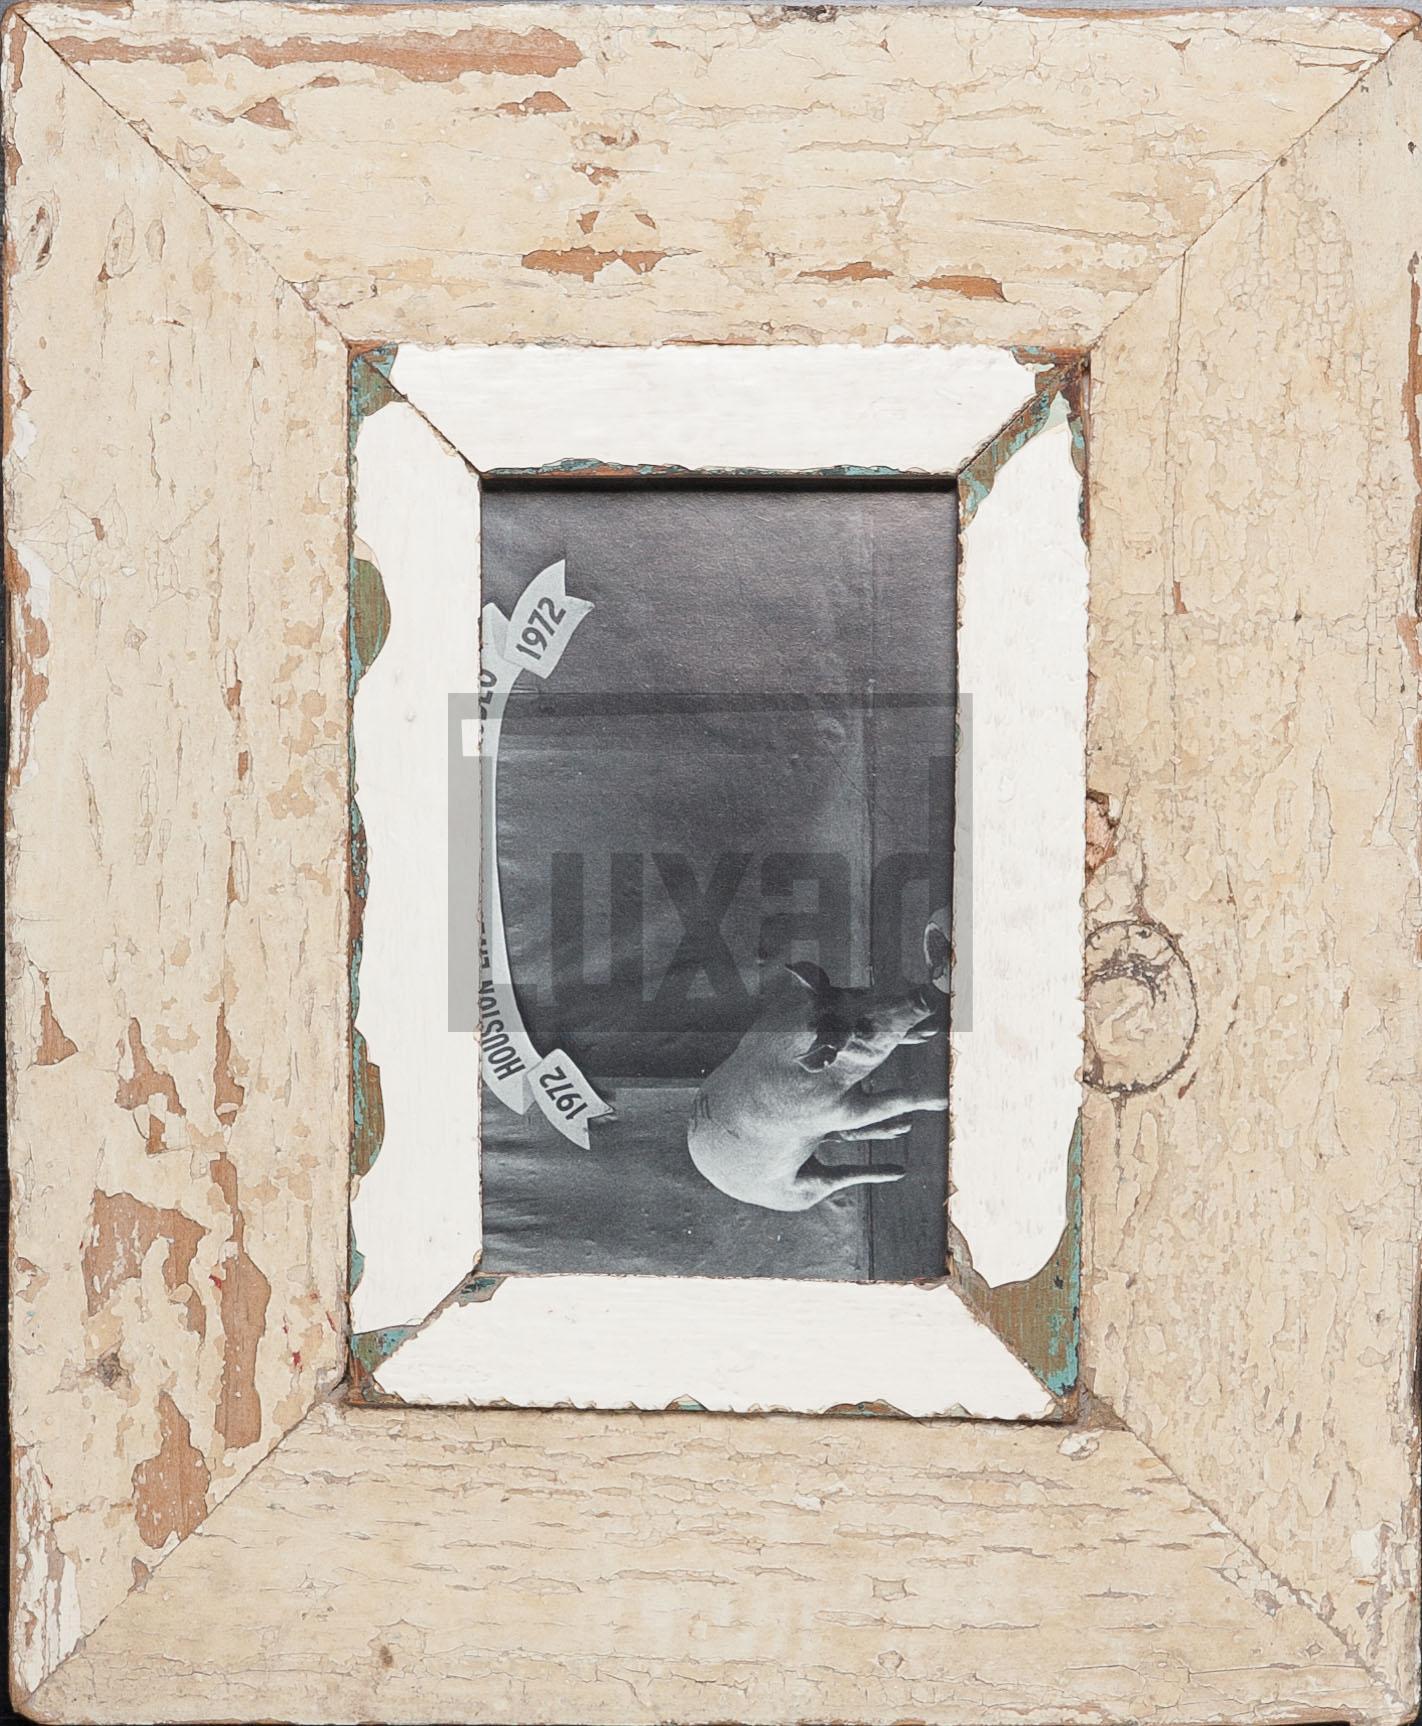 Vintage-Fotorahmen aus recyceltem Holz für Postkarten